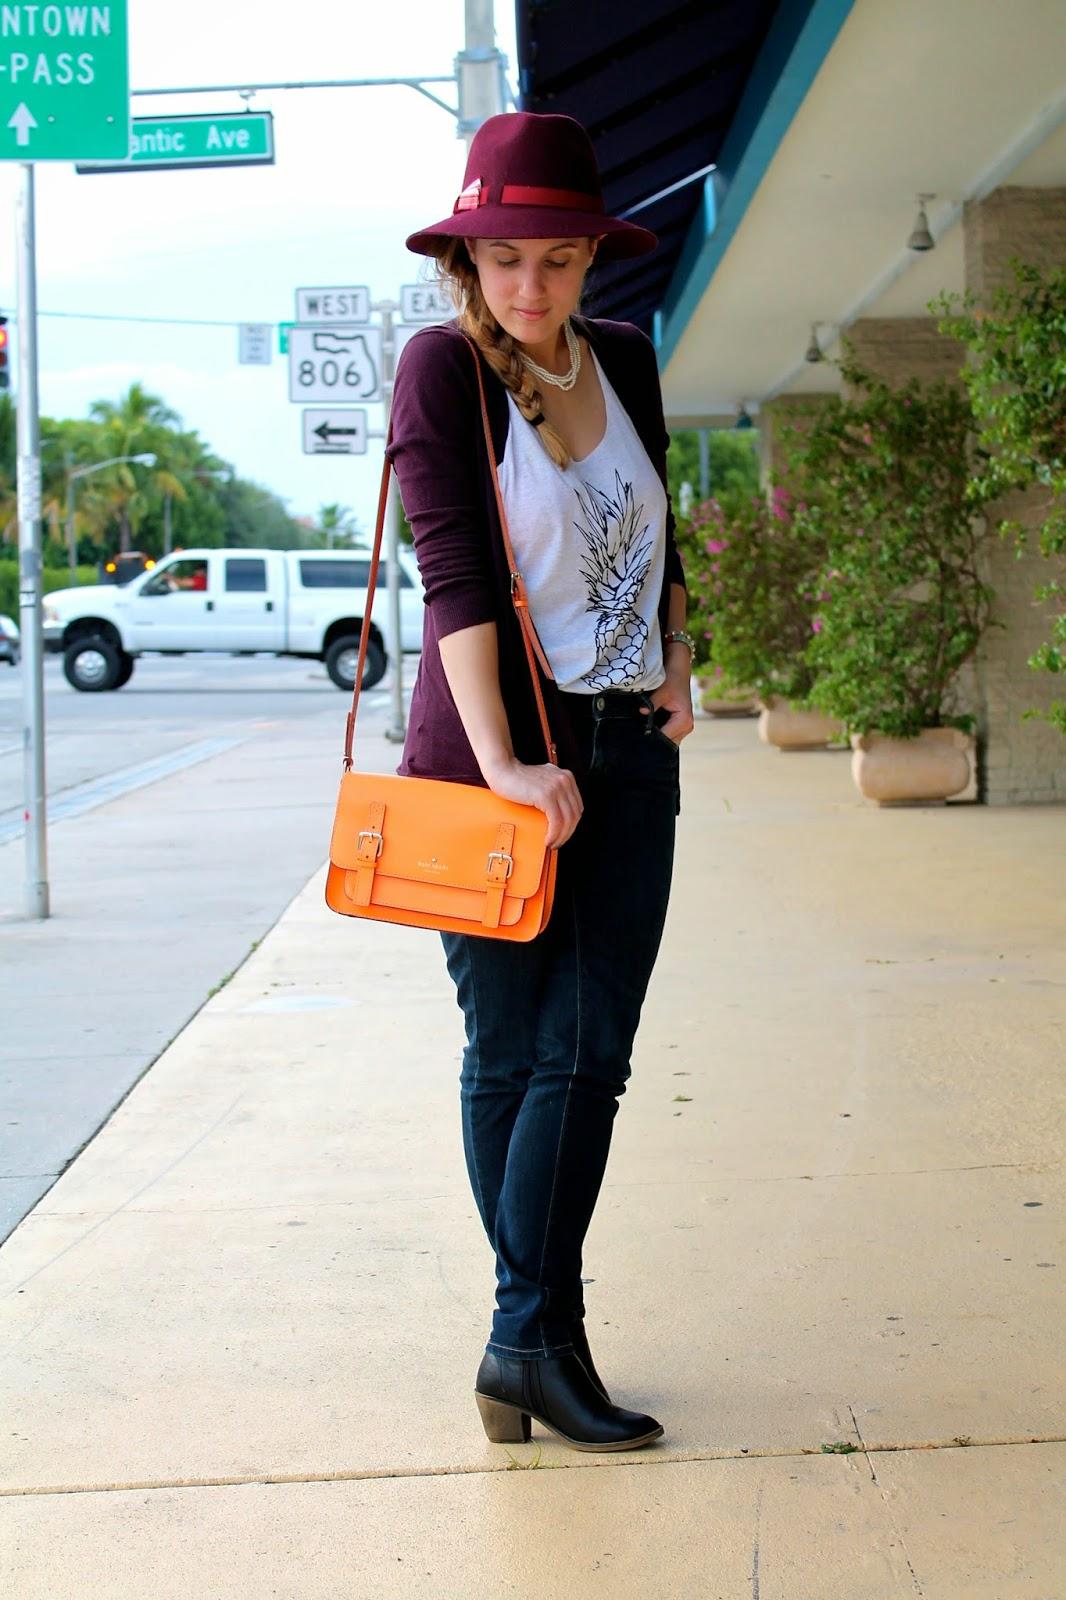 Bikini.com, Target, BCBG Maxazria, Levi's, Kate Spade, style, fashion, fashion blog, Miami fashion blogger, what I wore, tropical prints, look book, style blog, street style, burgundy, fedora